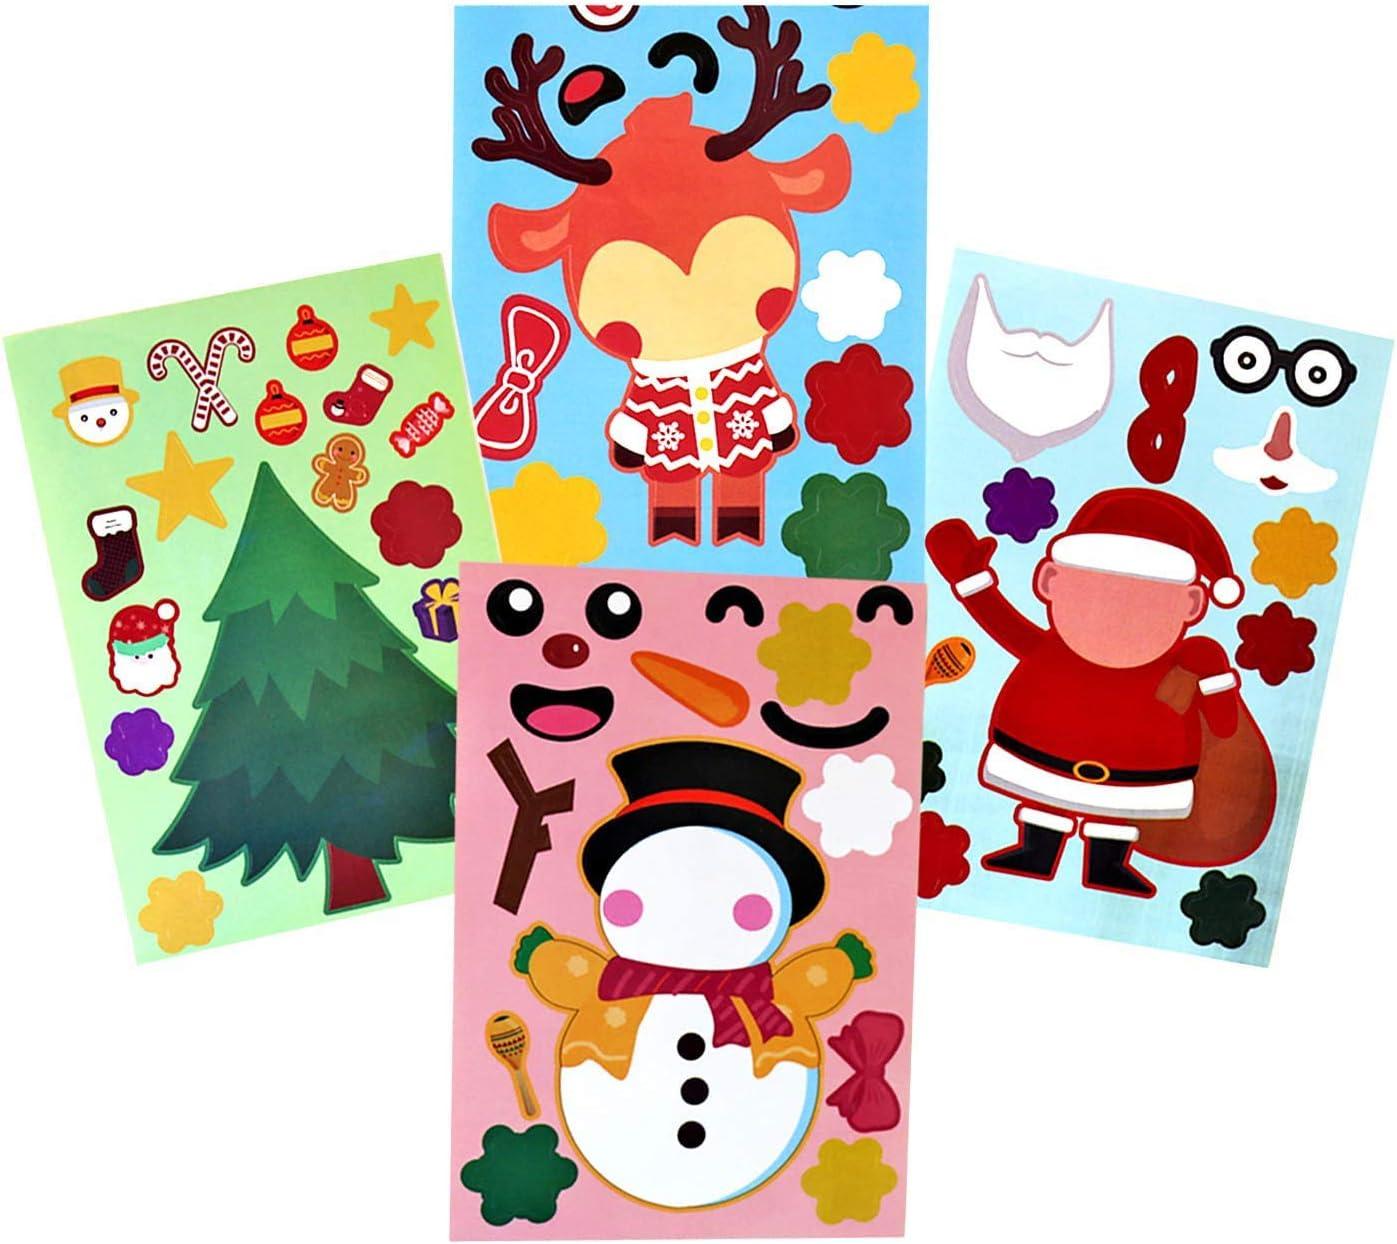 Funnlot Christmas Stickers for Kids /24 PCS Christmas Party Games for Kids Make Your Own Christmas Stickers Face Stickers Snowman Santa Gingerbread Reindeer Face Stickers